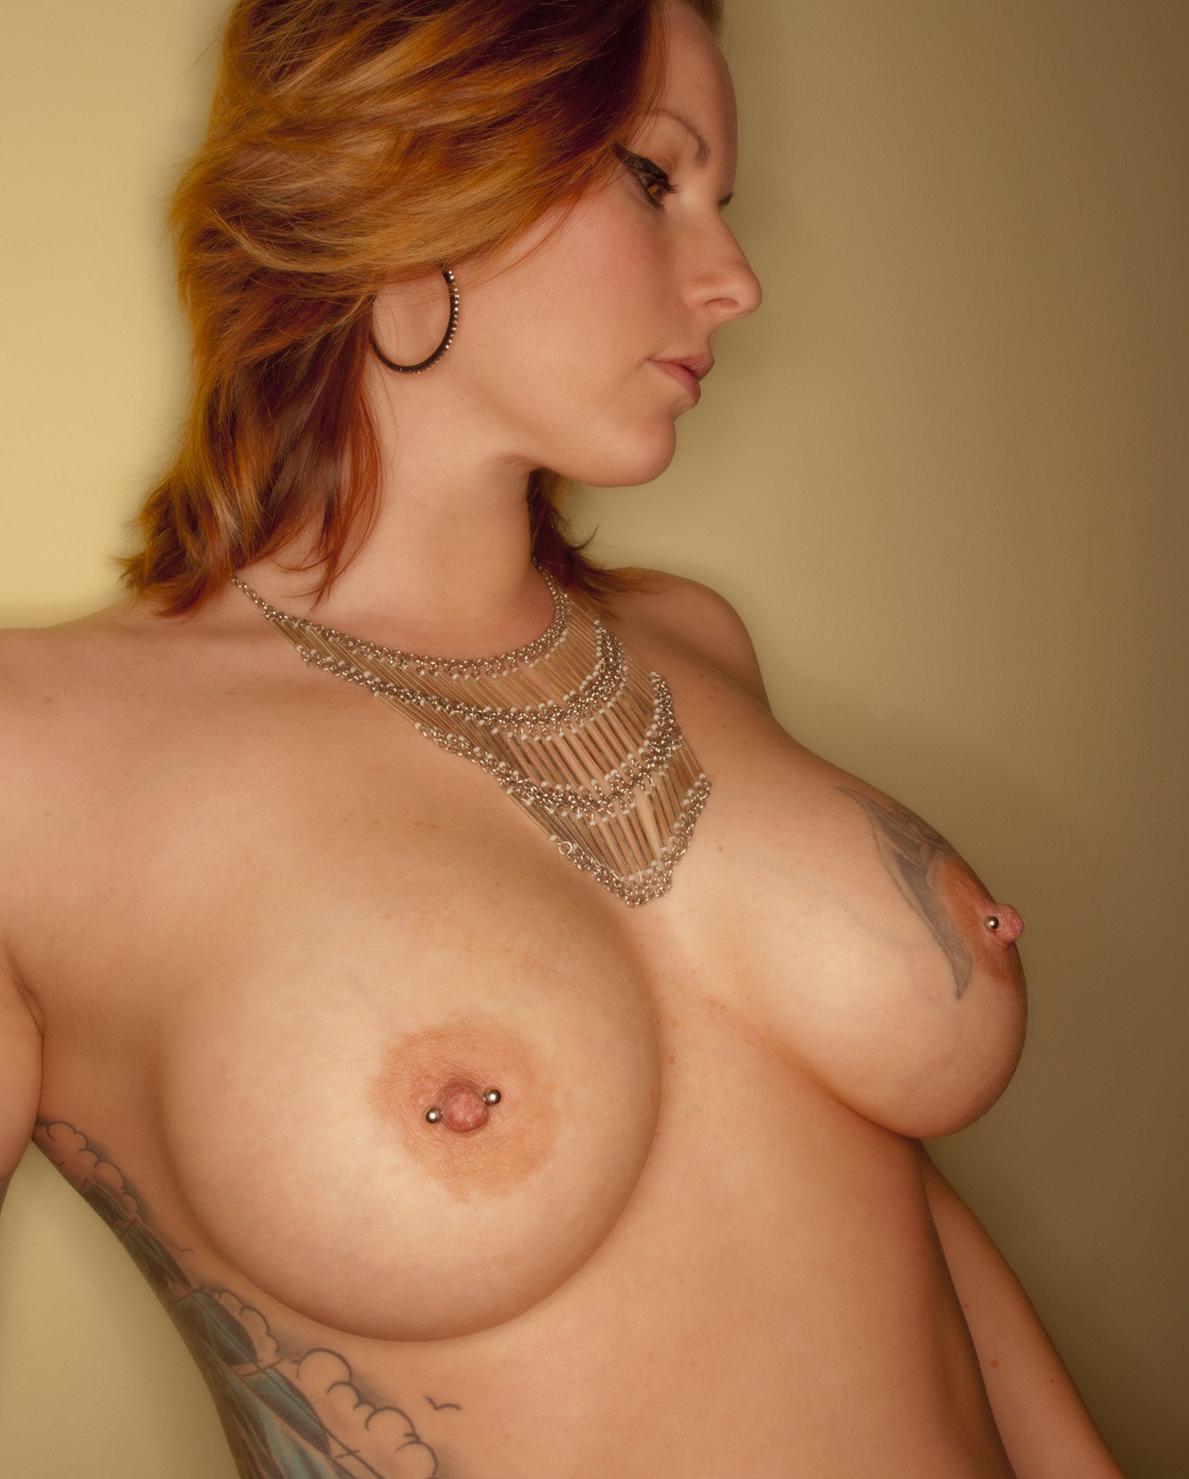 tumblr naked women Nude mature older